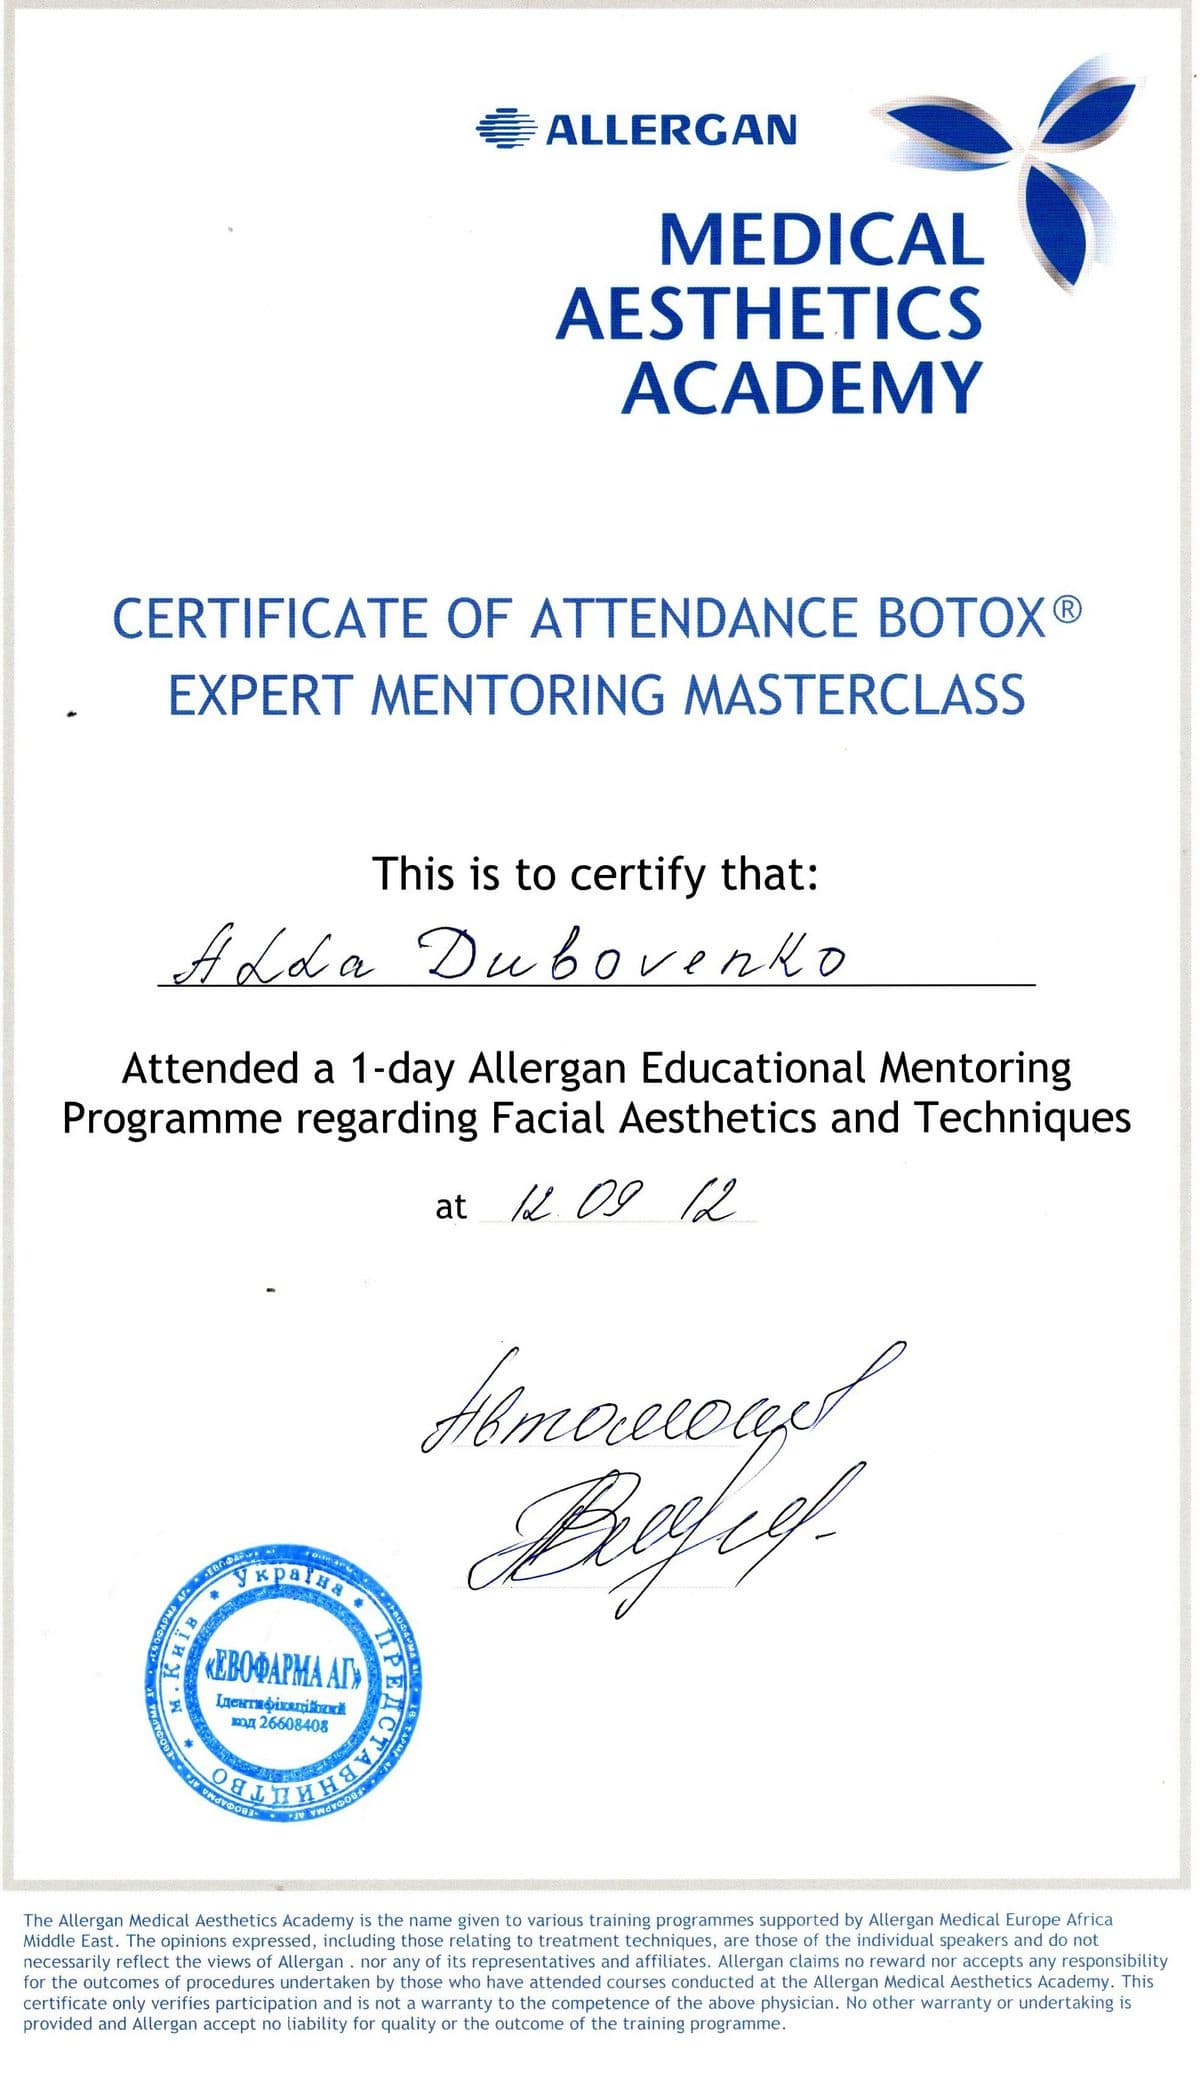 Документ №:5 Сертификат врача-дерматолога, косметолога Дубовенко Аллы Владимировны